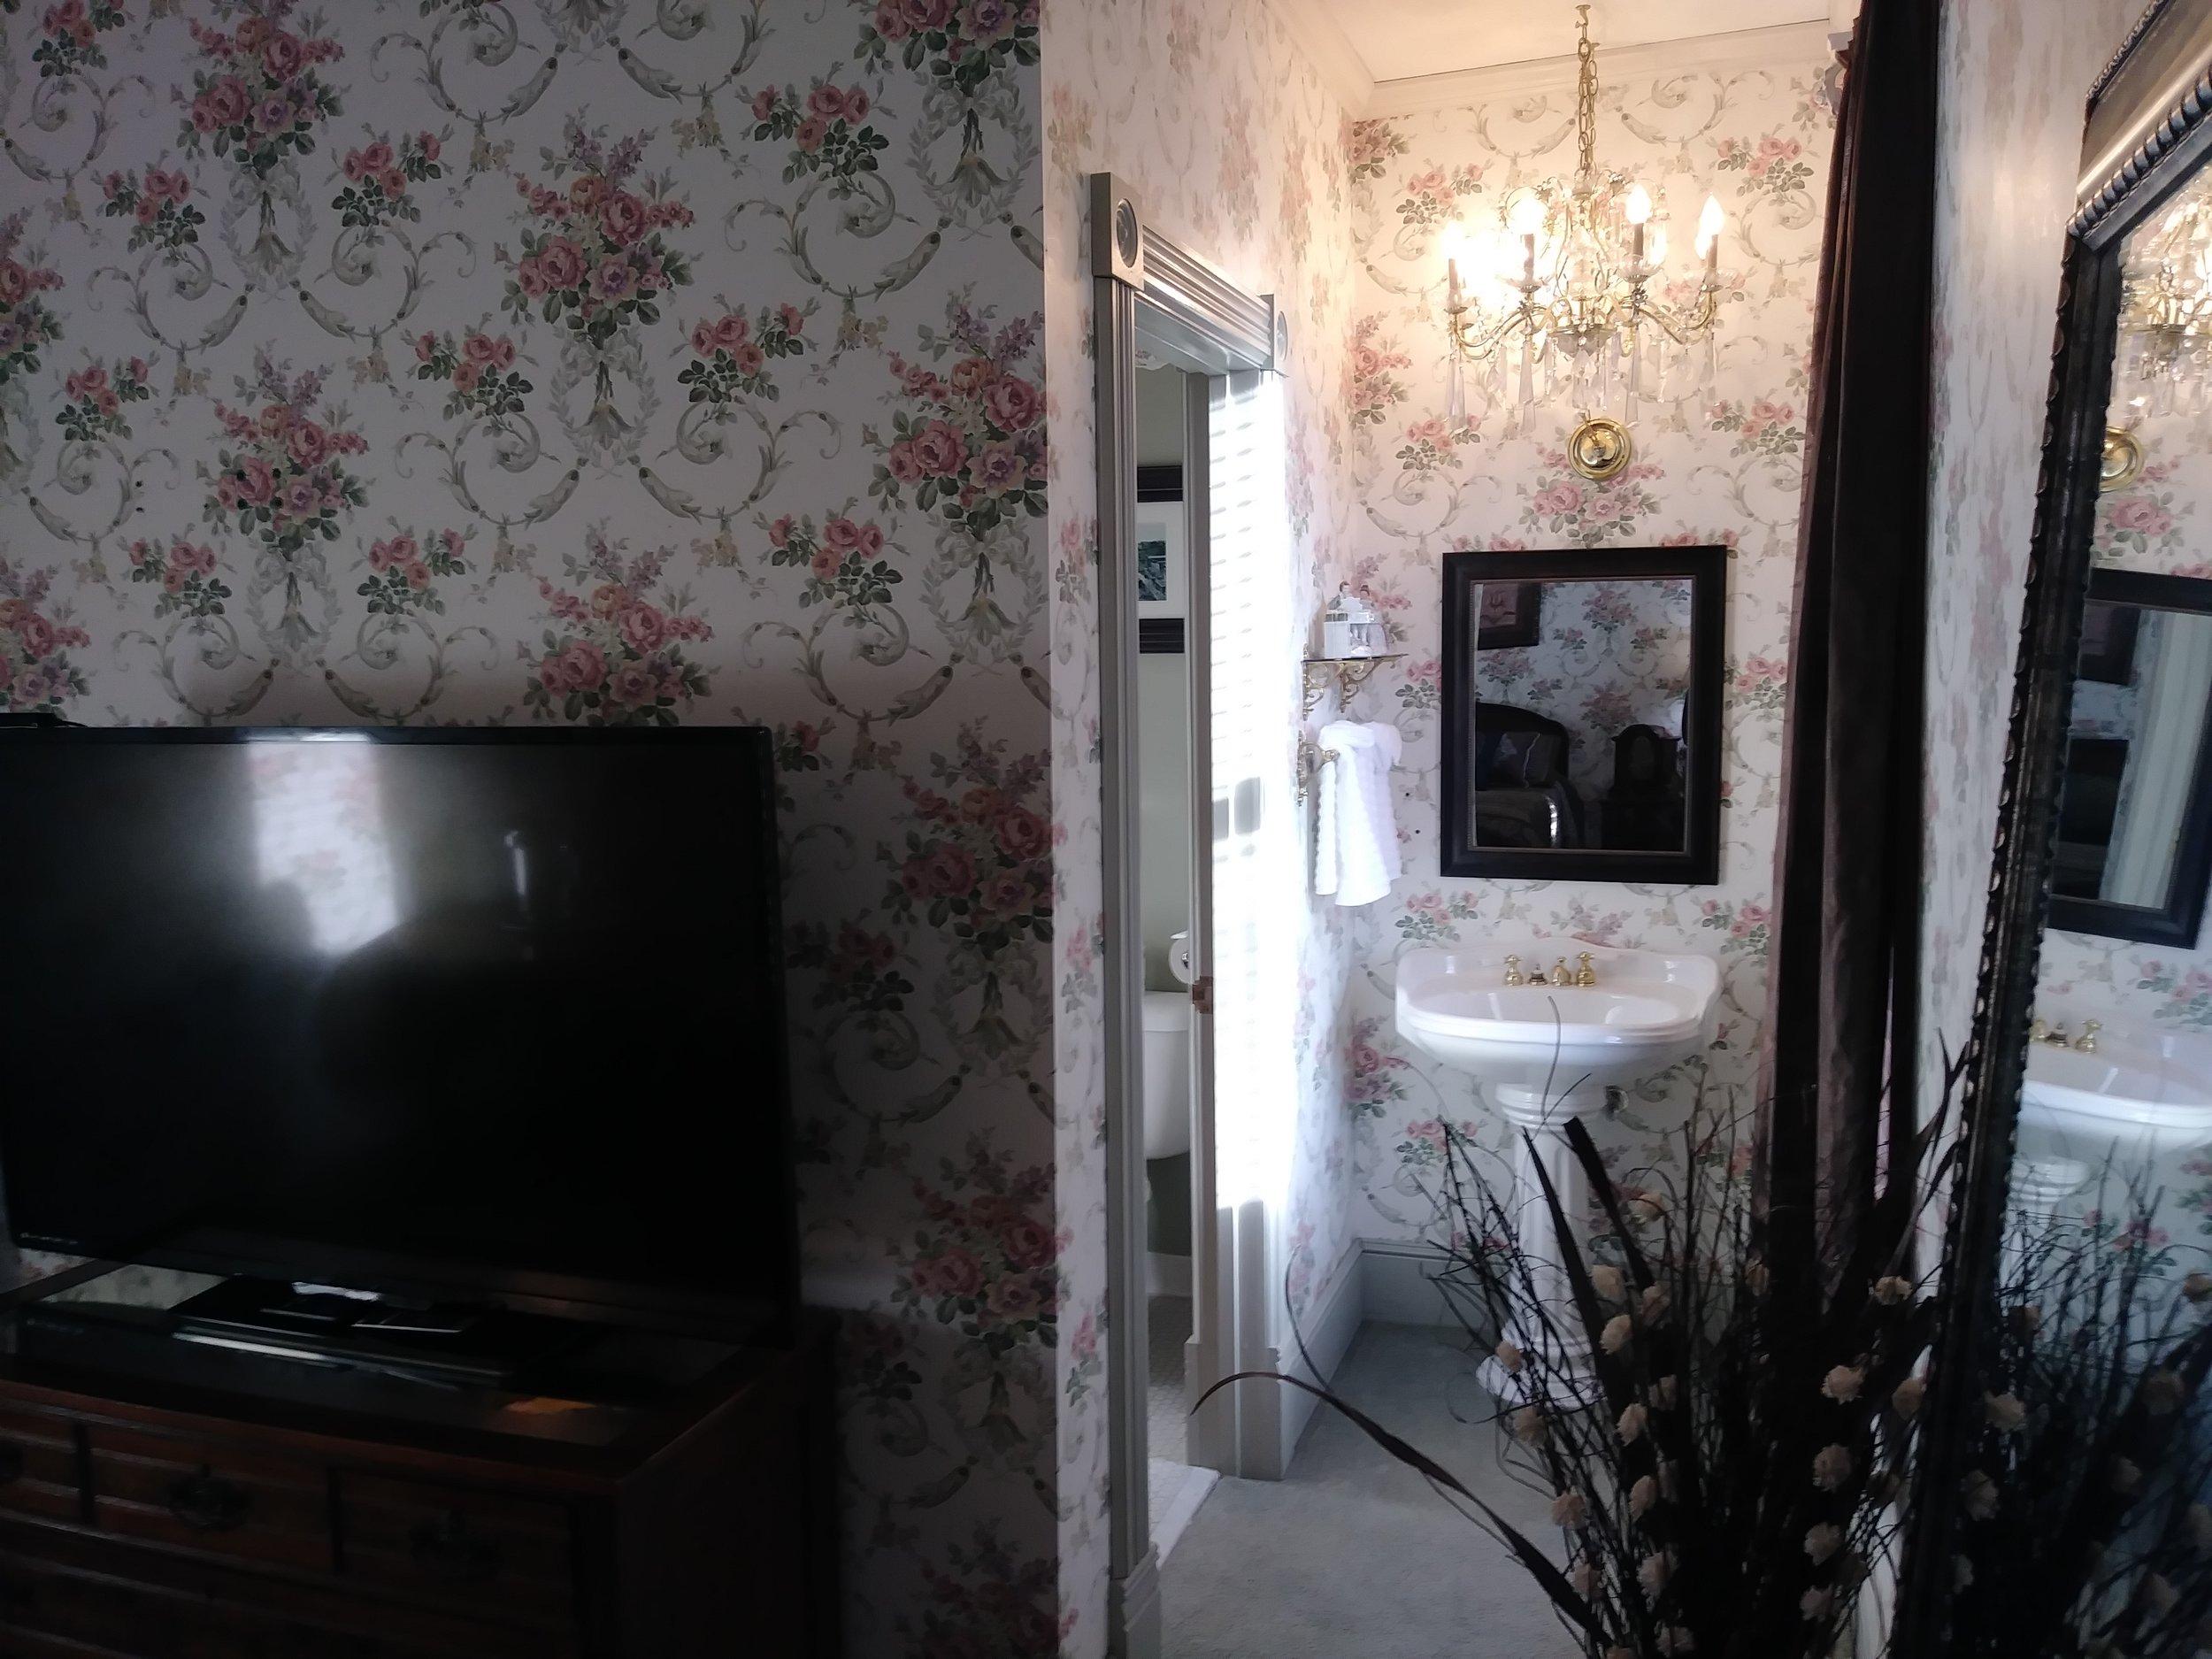 Room 202 09.jpg